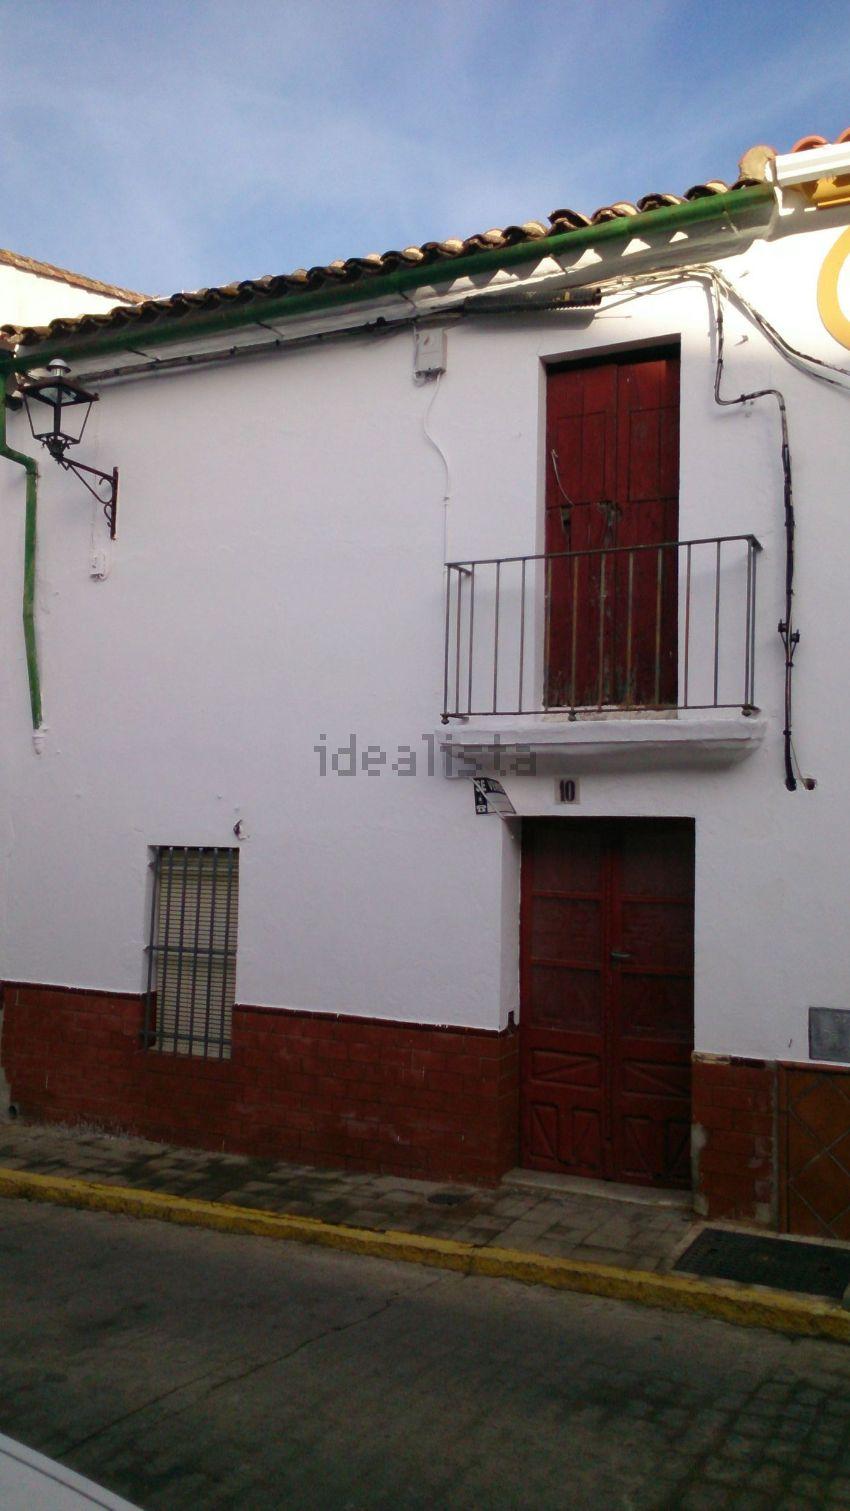 Casa o chalet independiente en Herrero, 10, Cortegana